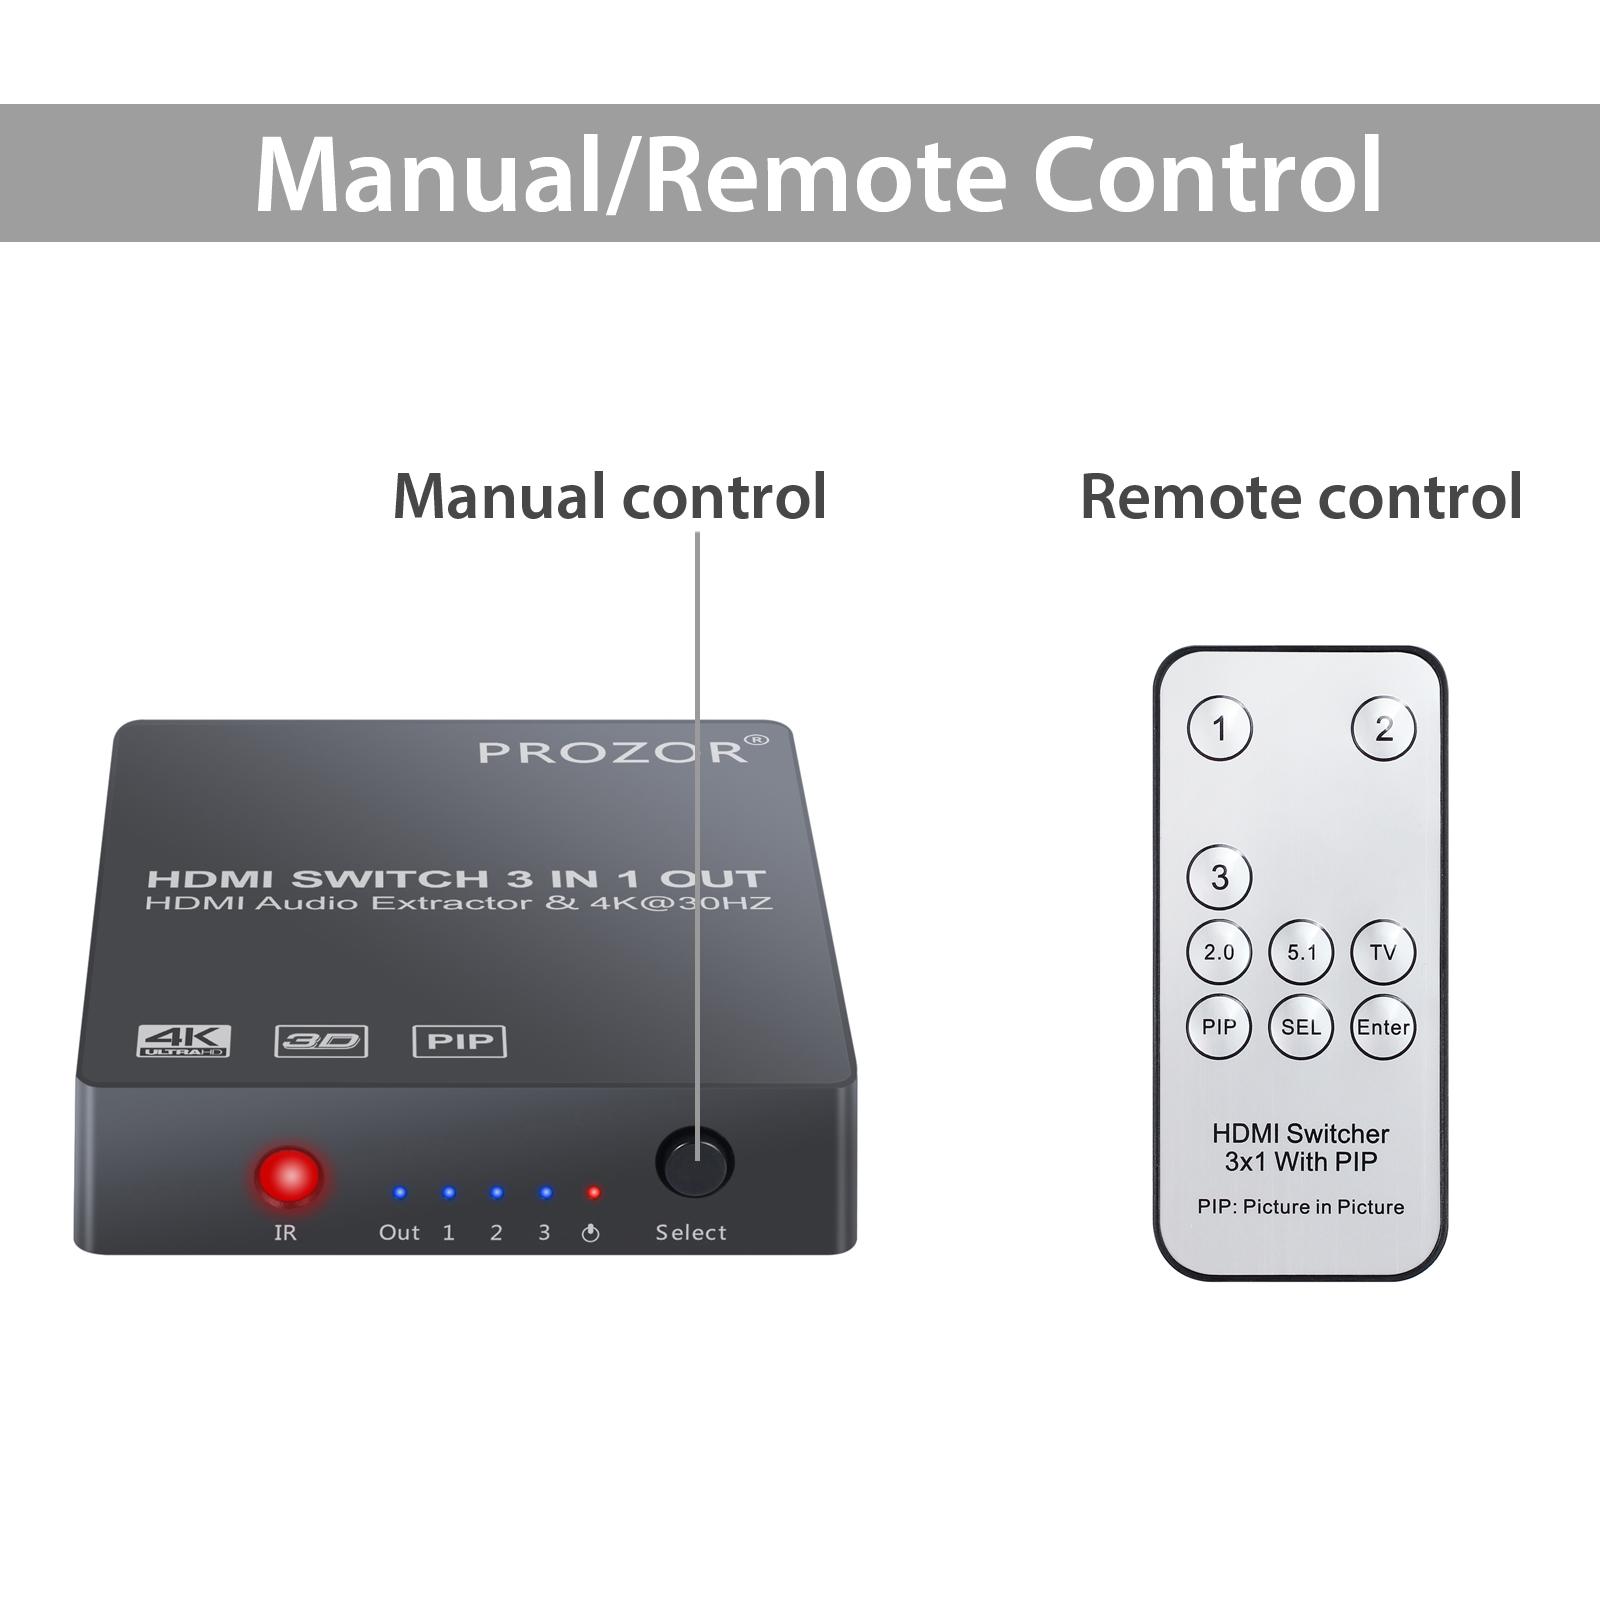 Audio Extractor 4k Hdmi Optical Toslink Spdif 35mm Stereo Pip Ir S Pdif Receiver Item Description